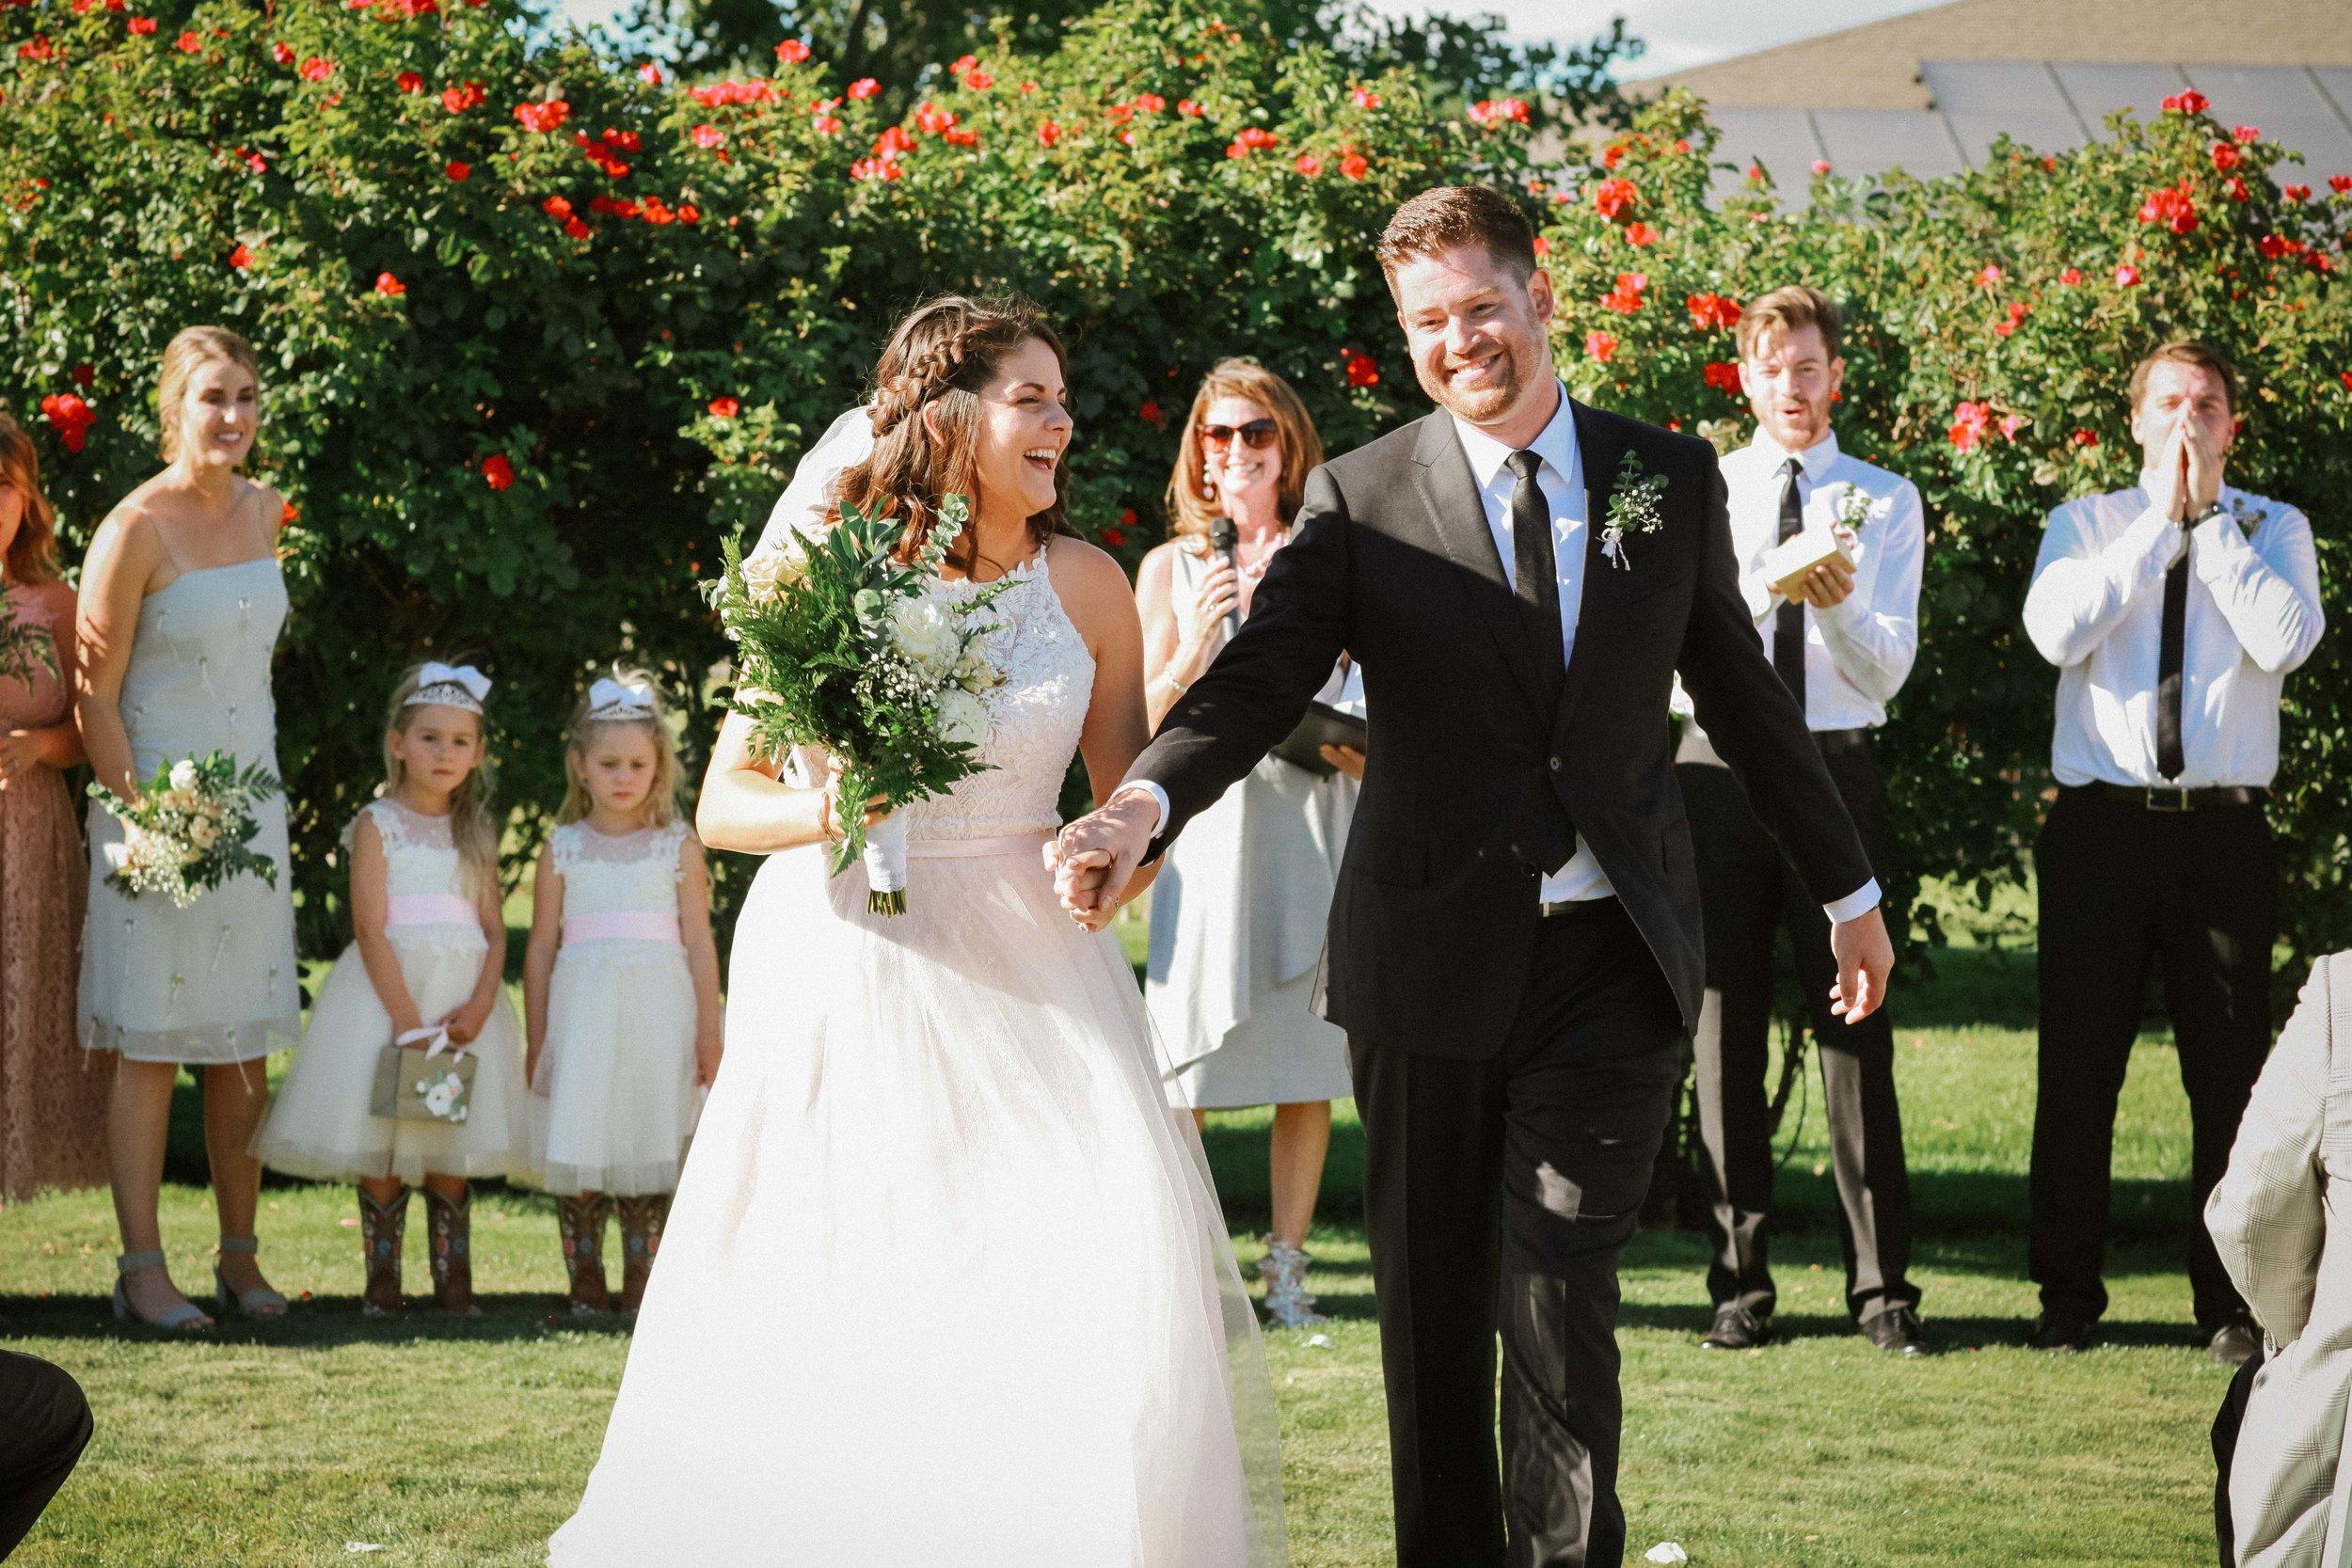 Rachel&Chase-Sneak Peek-40.jpg